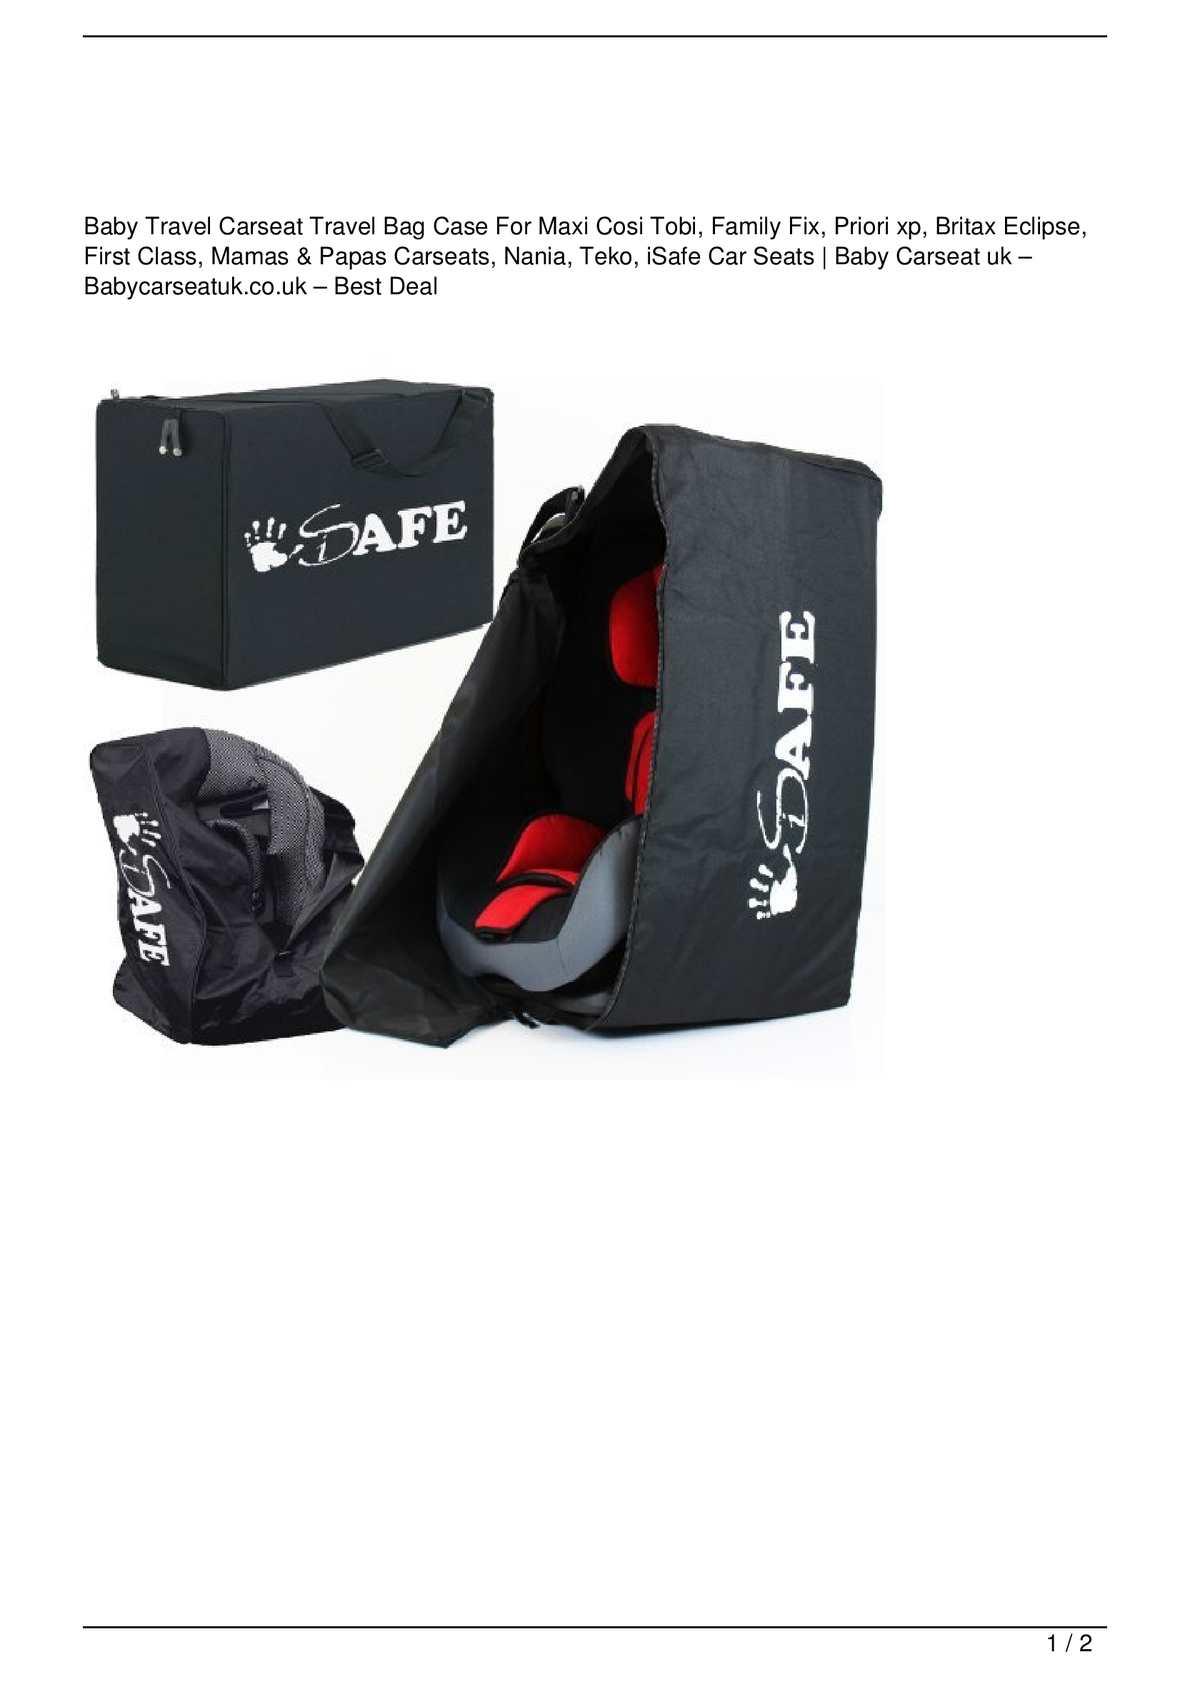 calam o baby travel carseat travel bag case for maxi cosi tobi family fix priori xp britax. Black Bedroom Furniture Sets. Home Design Ideas